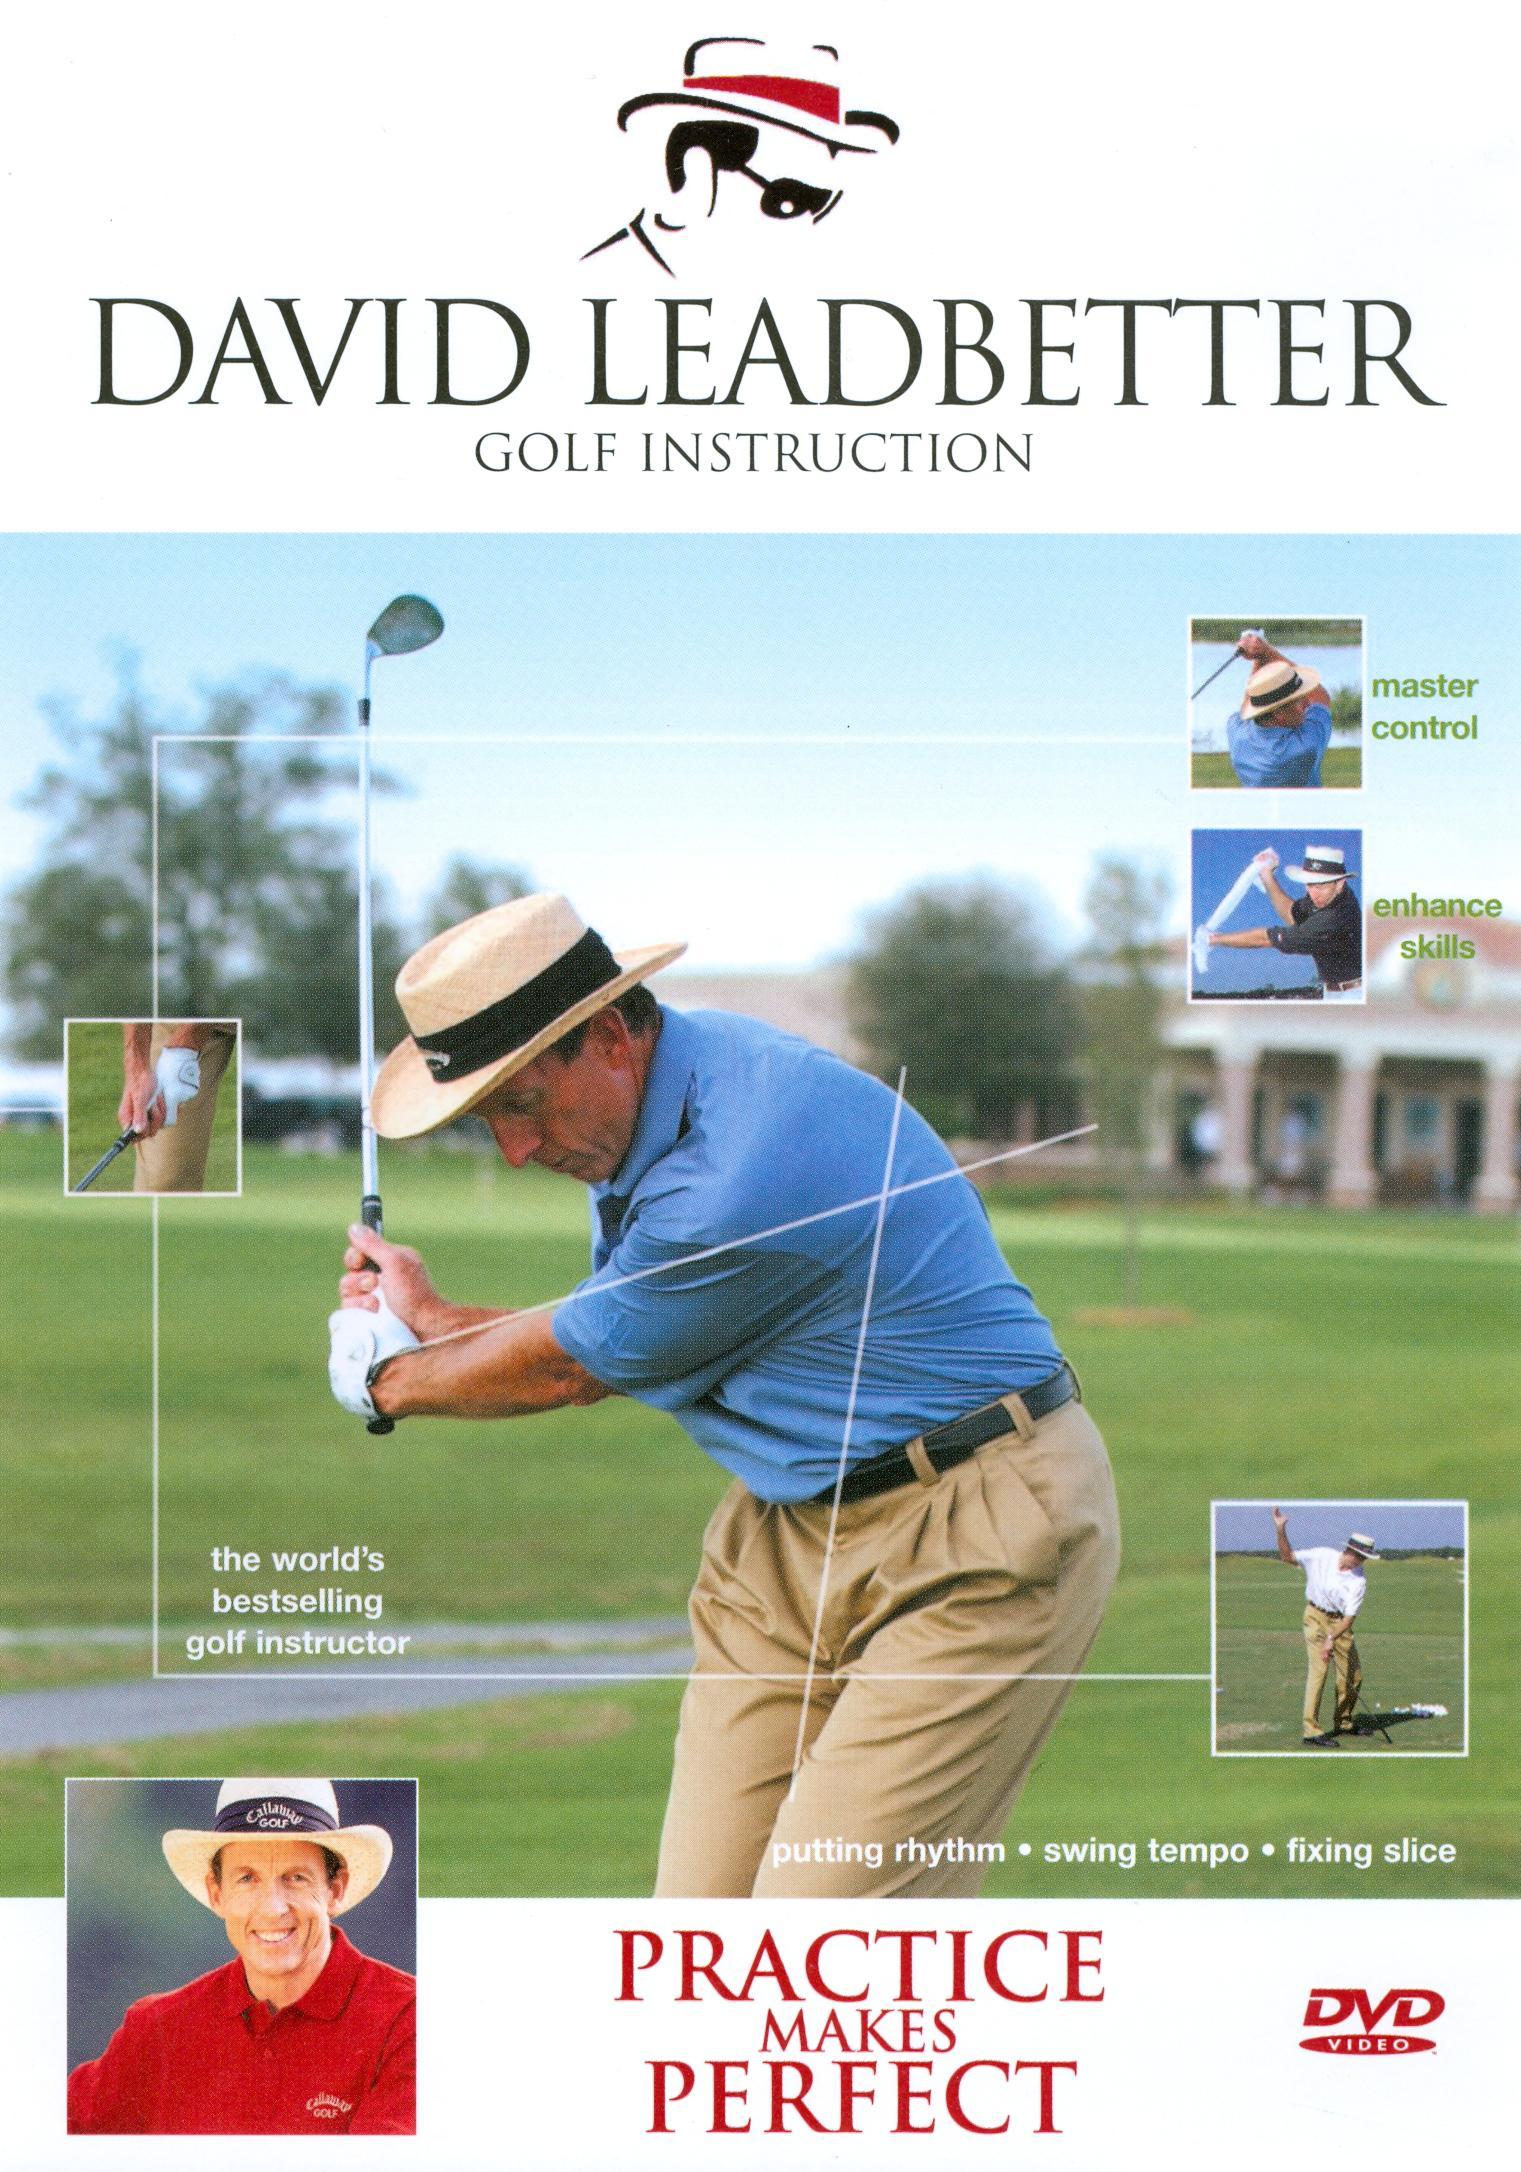 David Leadbetter Golf Instruction: Practice Makes Perfect